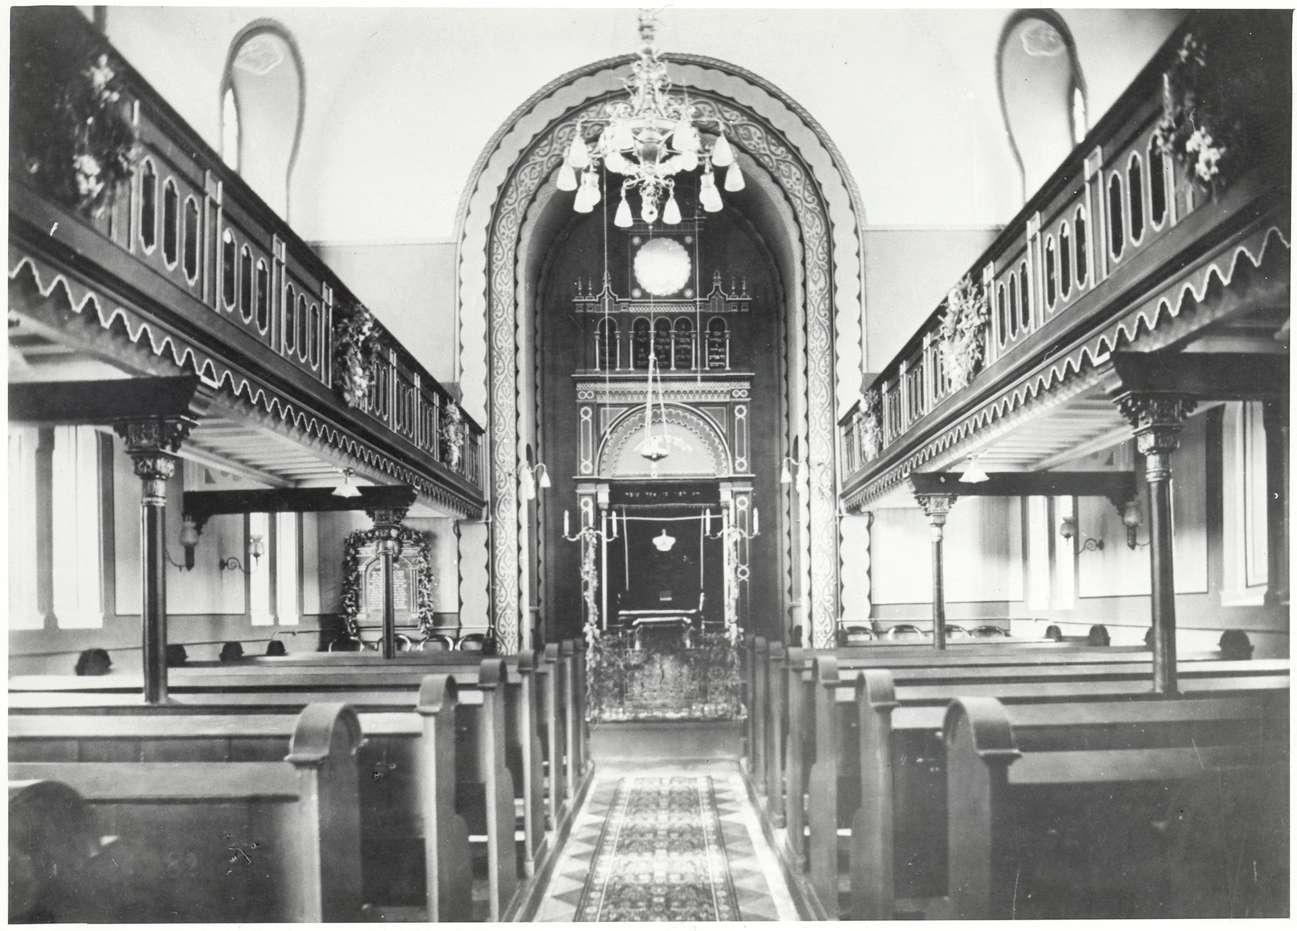 Emmendingen, EM; Synagoge, Innenansicht, Bild 1